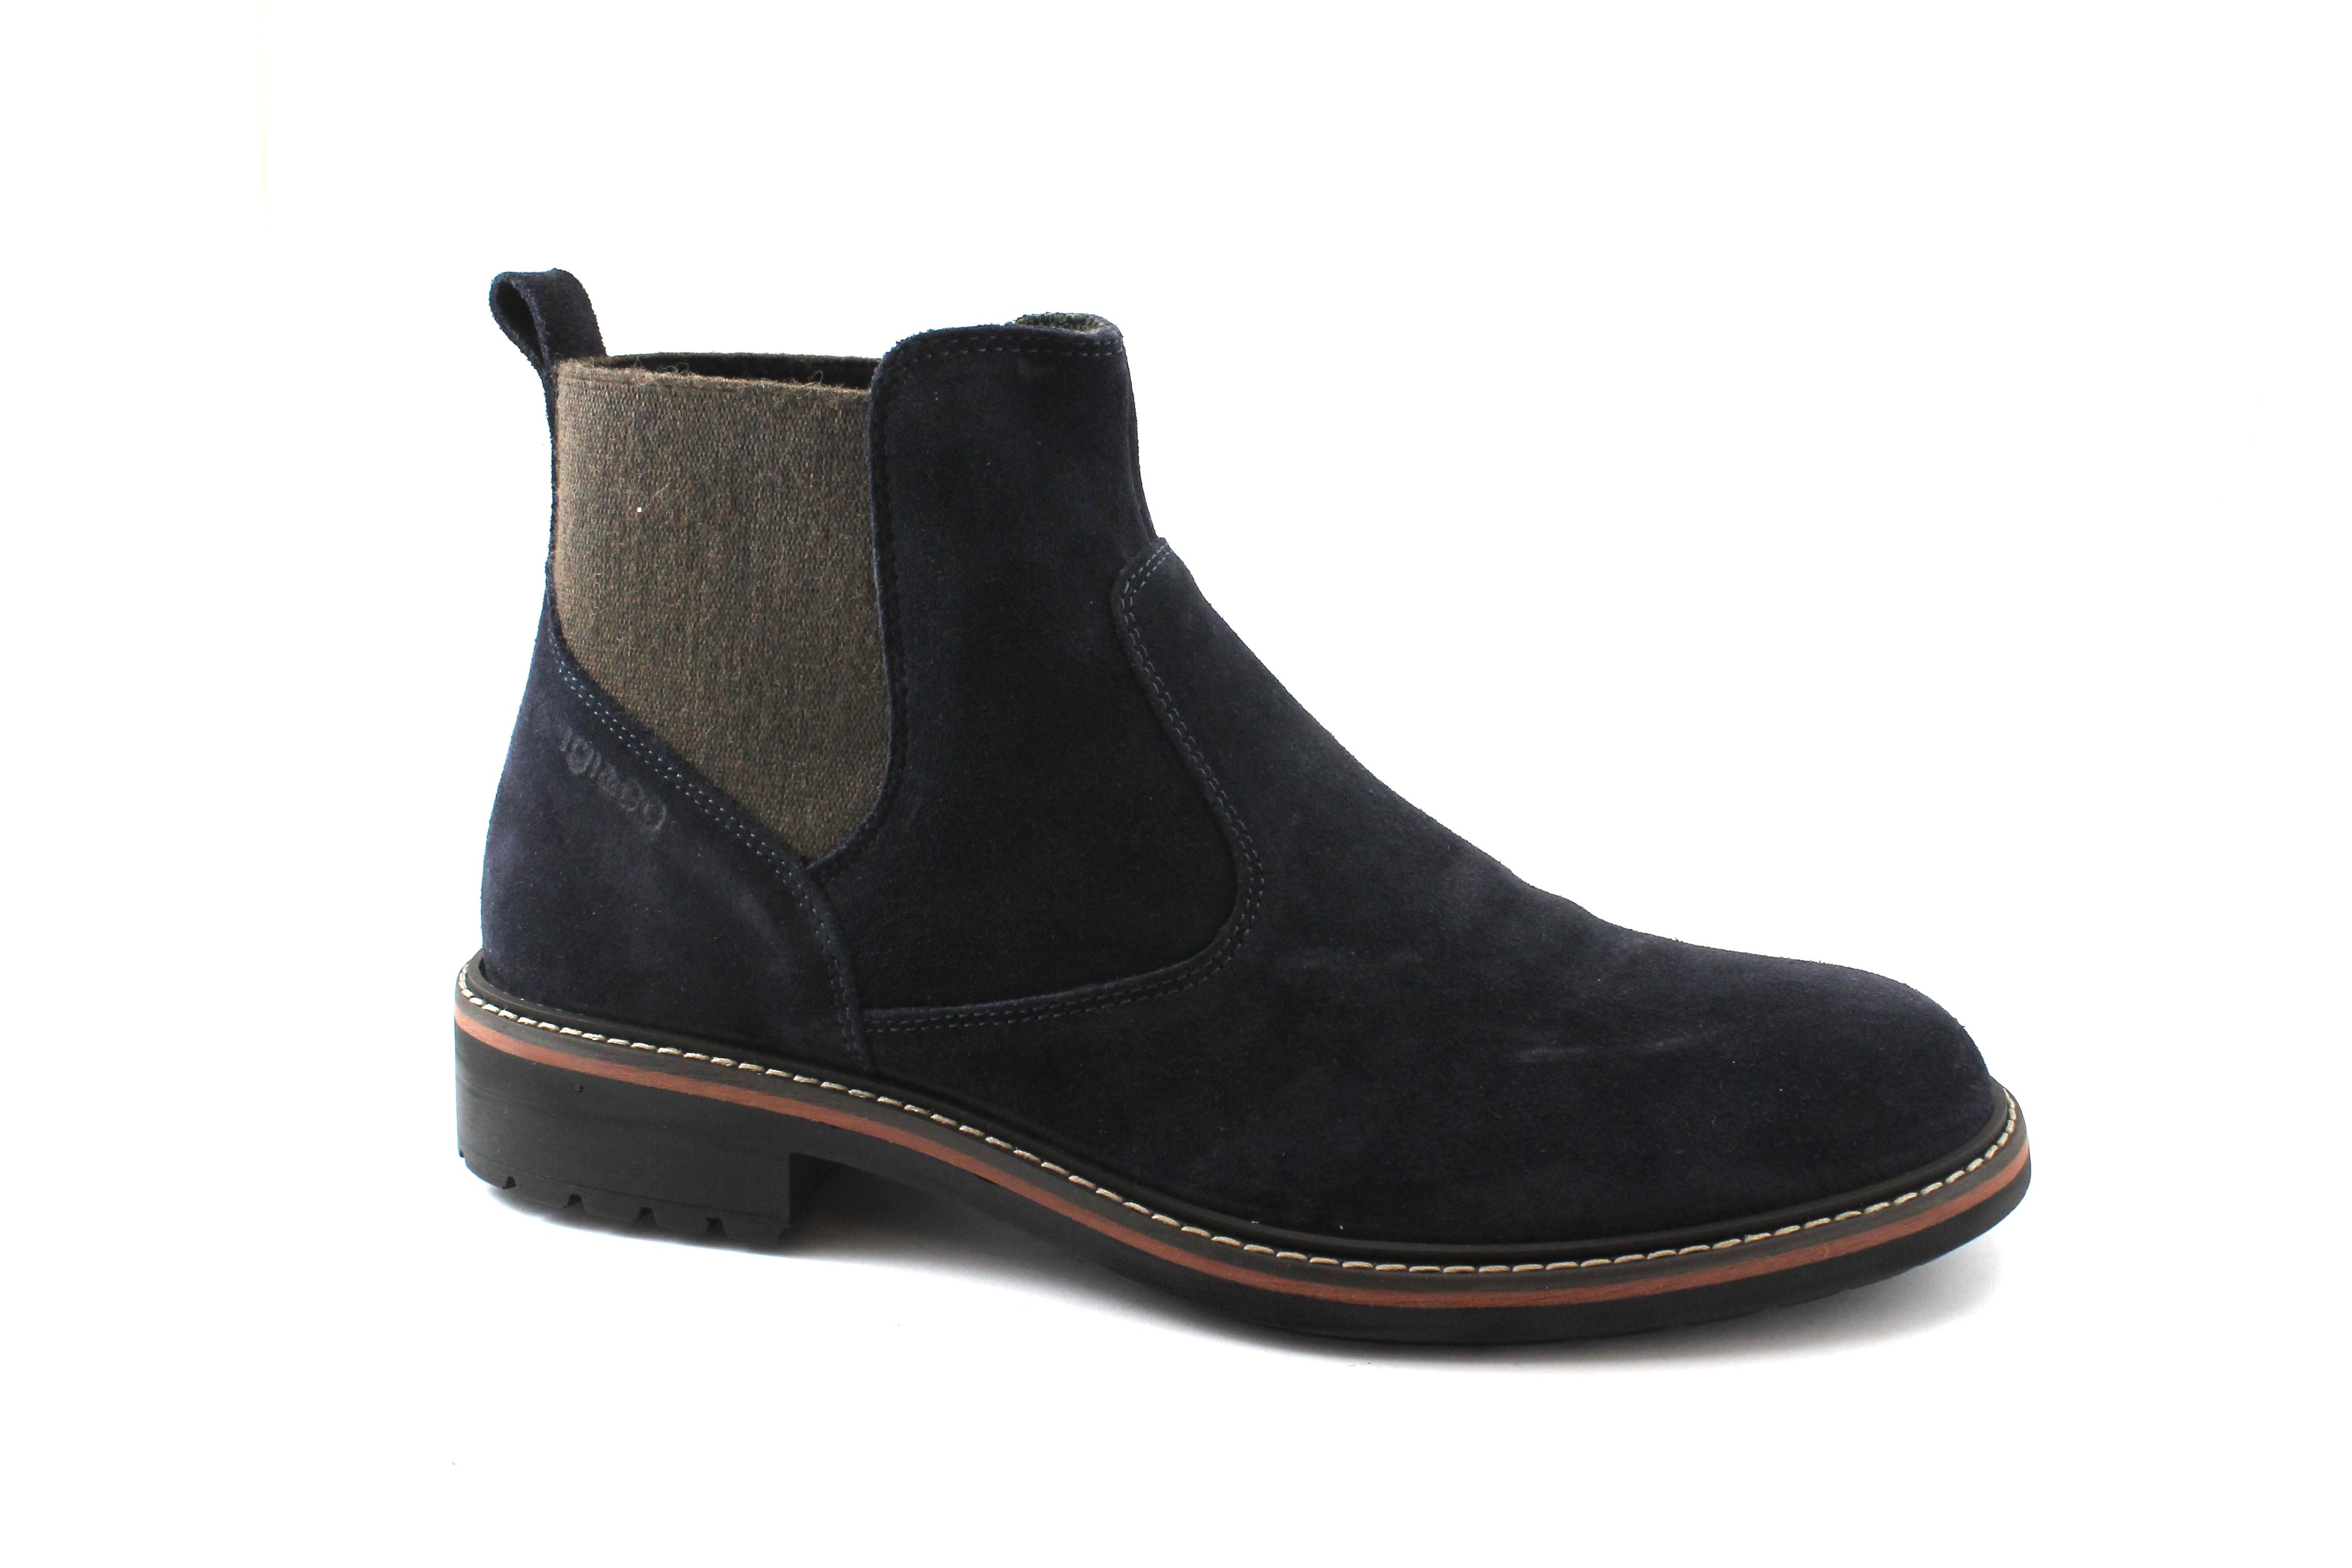 IGI&CO 2106422 beatles blu scarpe uomo stivaletti beatles 2106422 camoscio c5d1a2